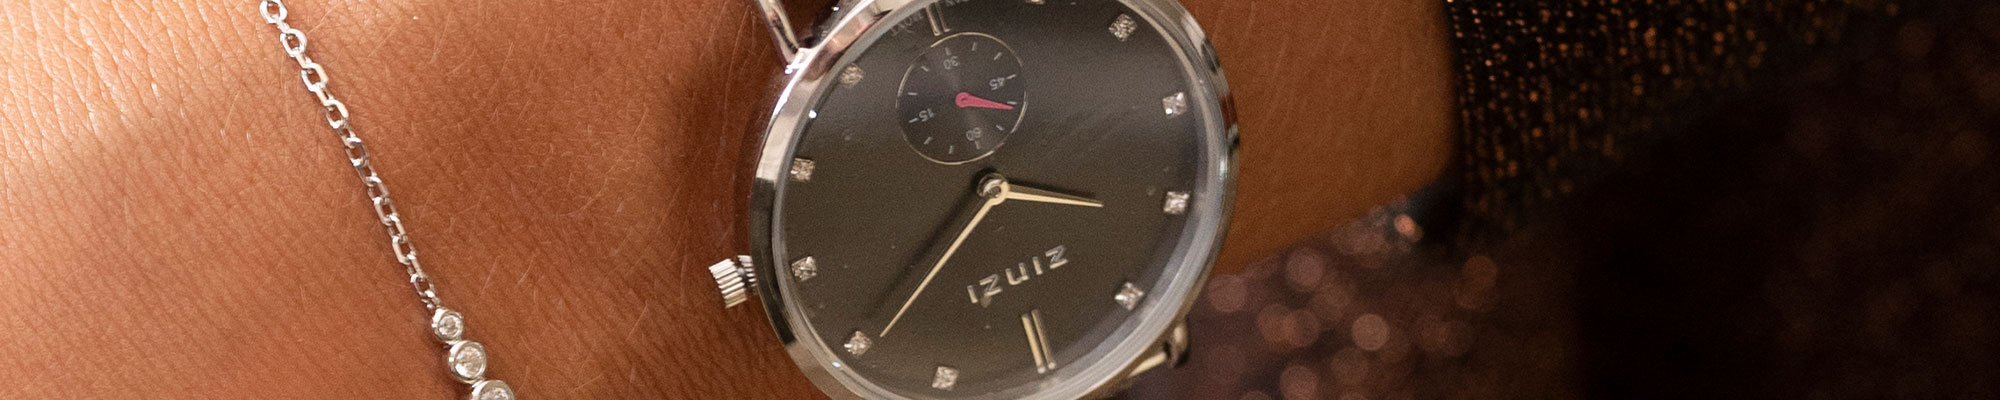 Glam Horloges